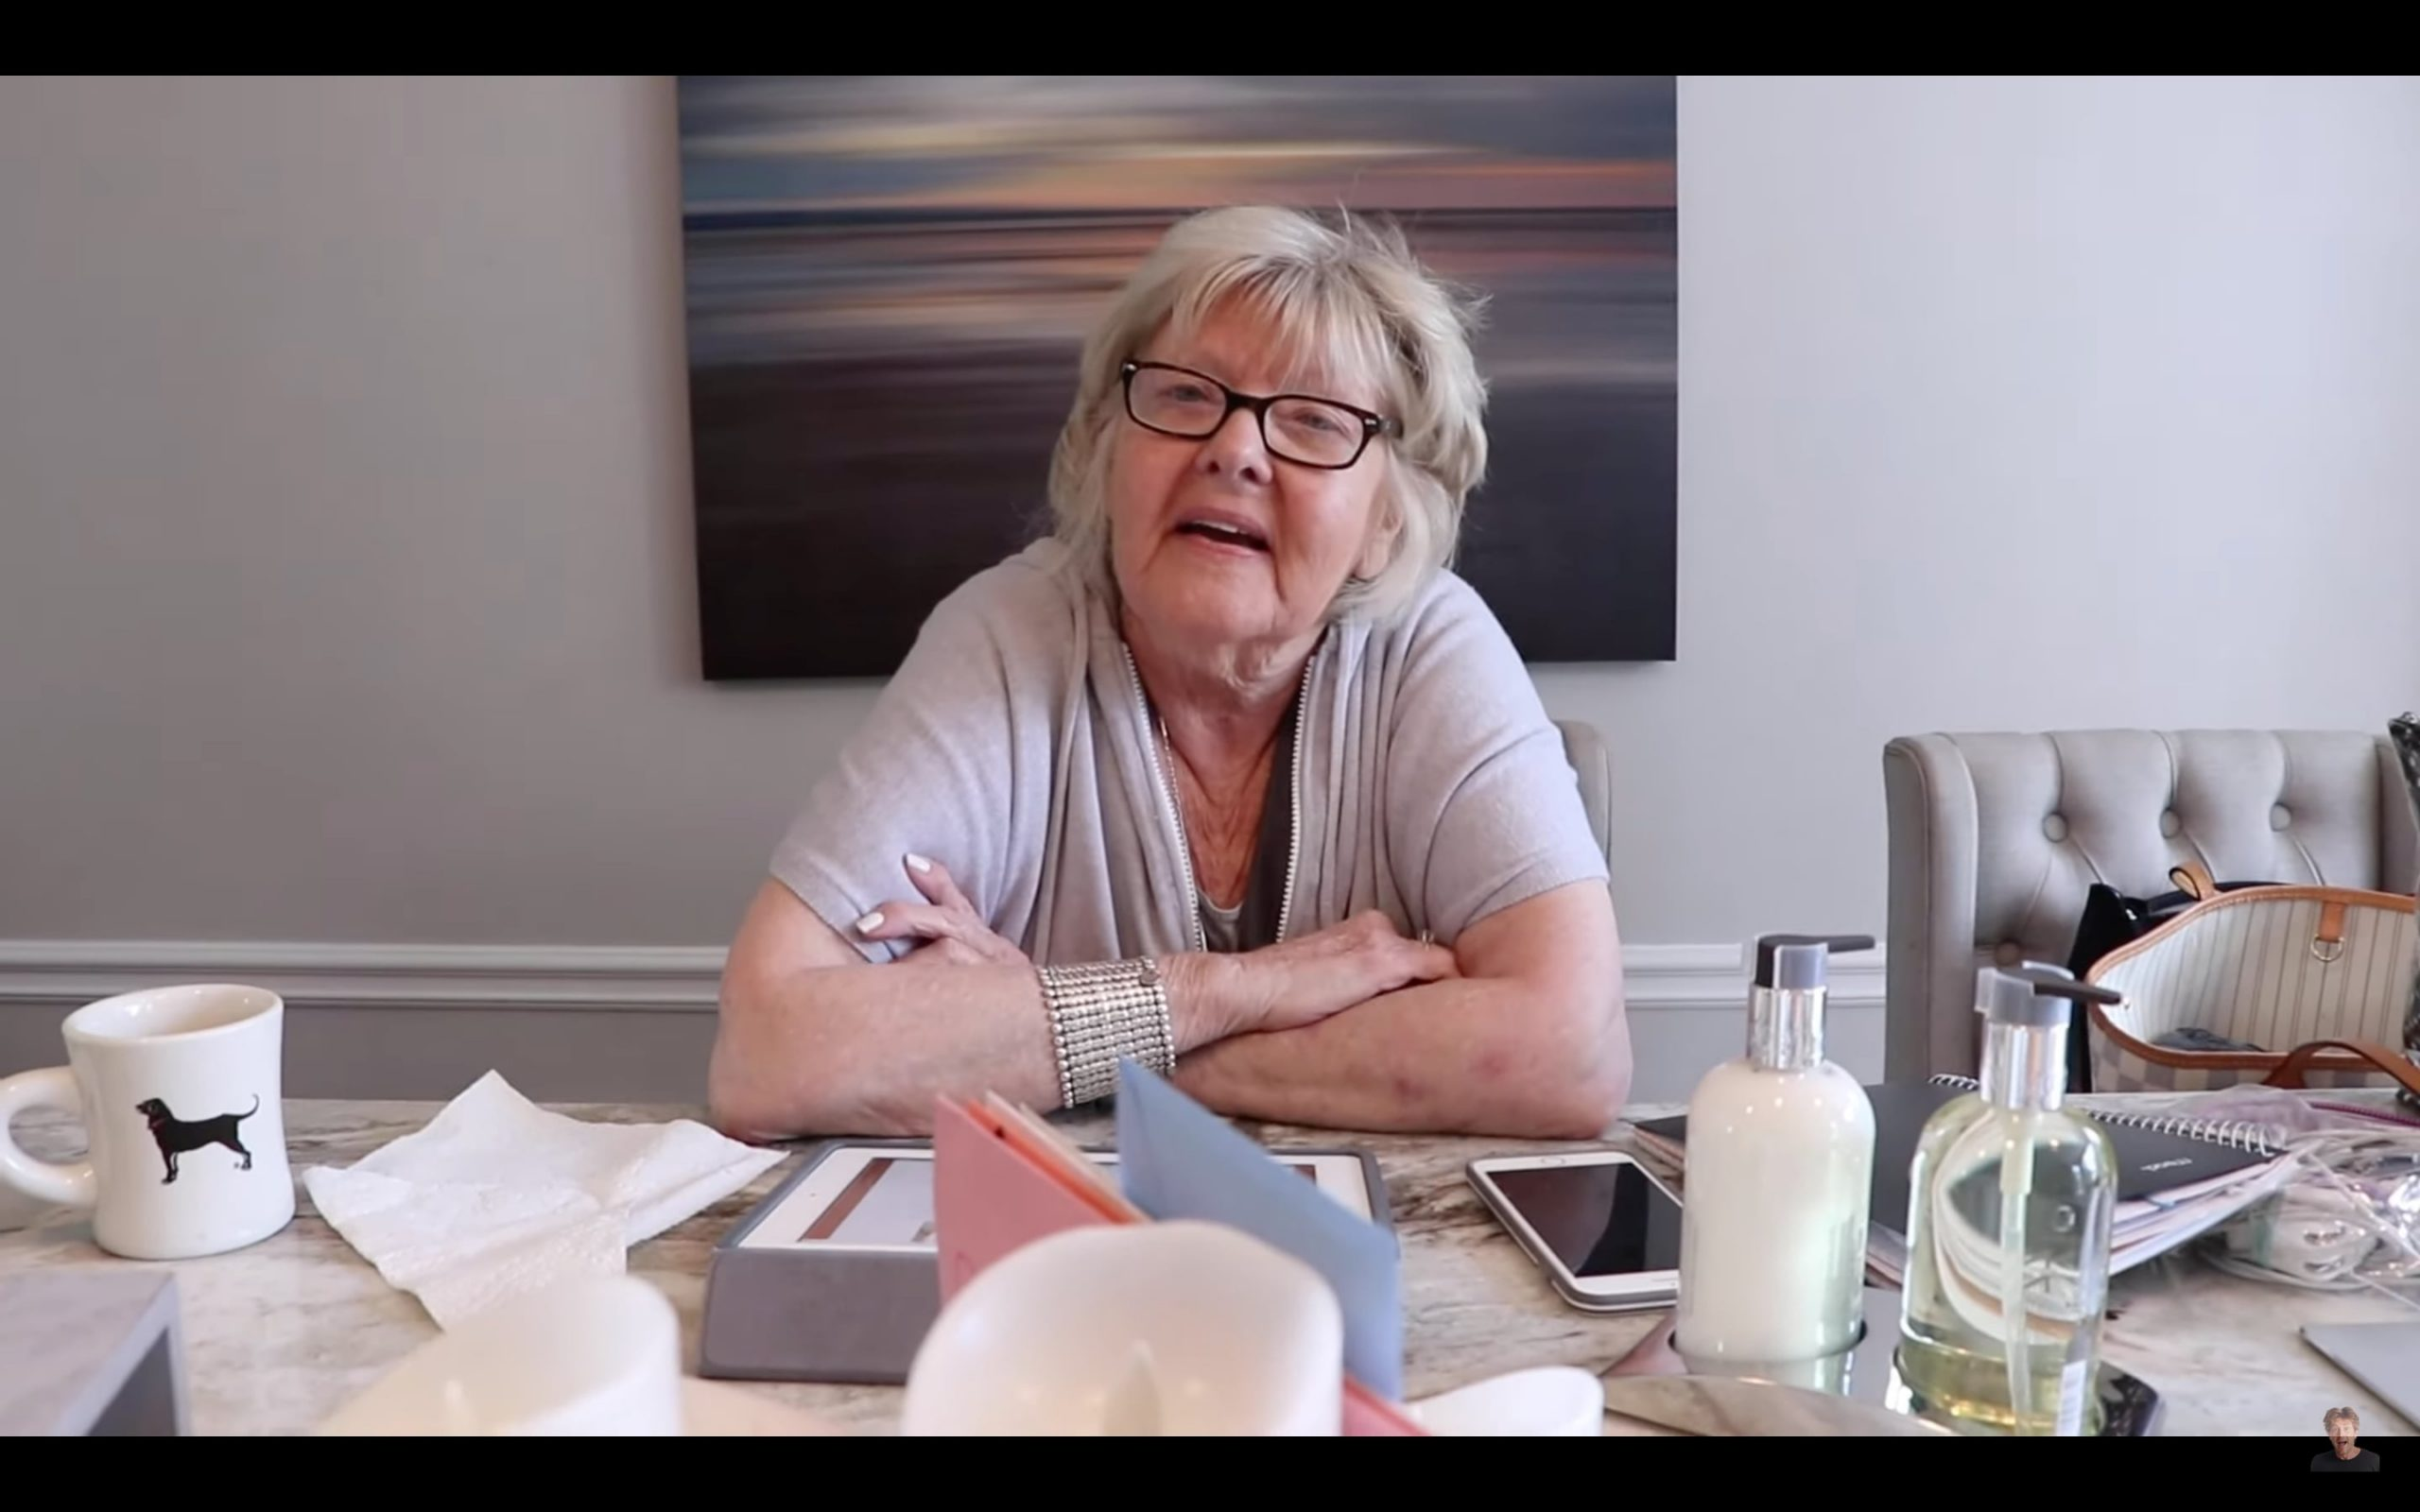 Who is Lorraine Nash?